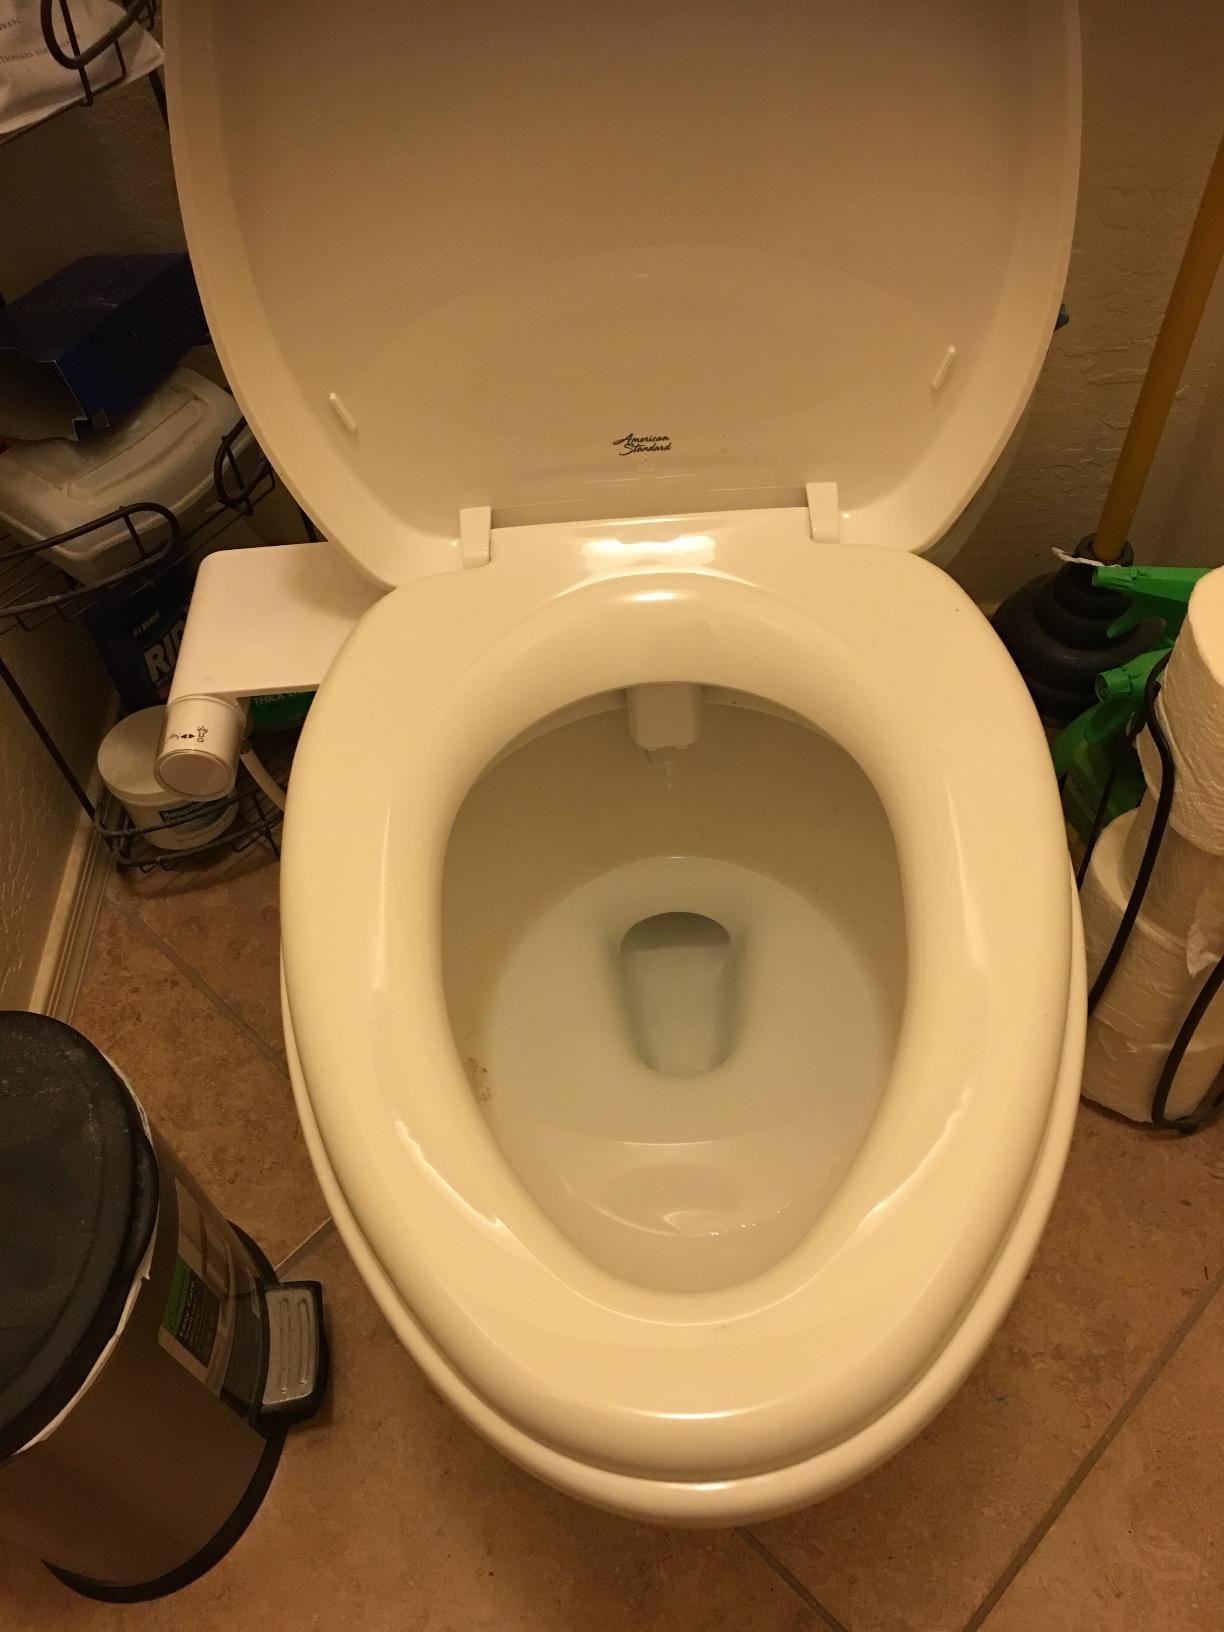 Incredible Best Bidet Toilet Seat Reviews For 2018 Bidet Toilet Seats Pdpeps Interior Chair Design Pdpepsorg